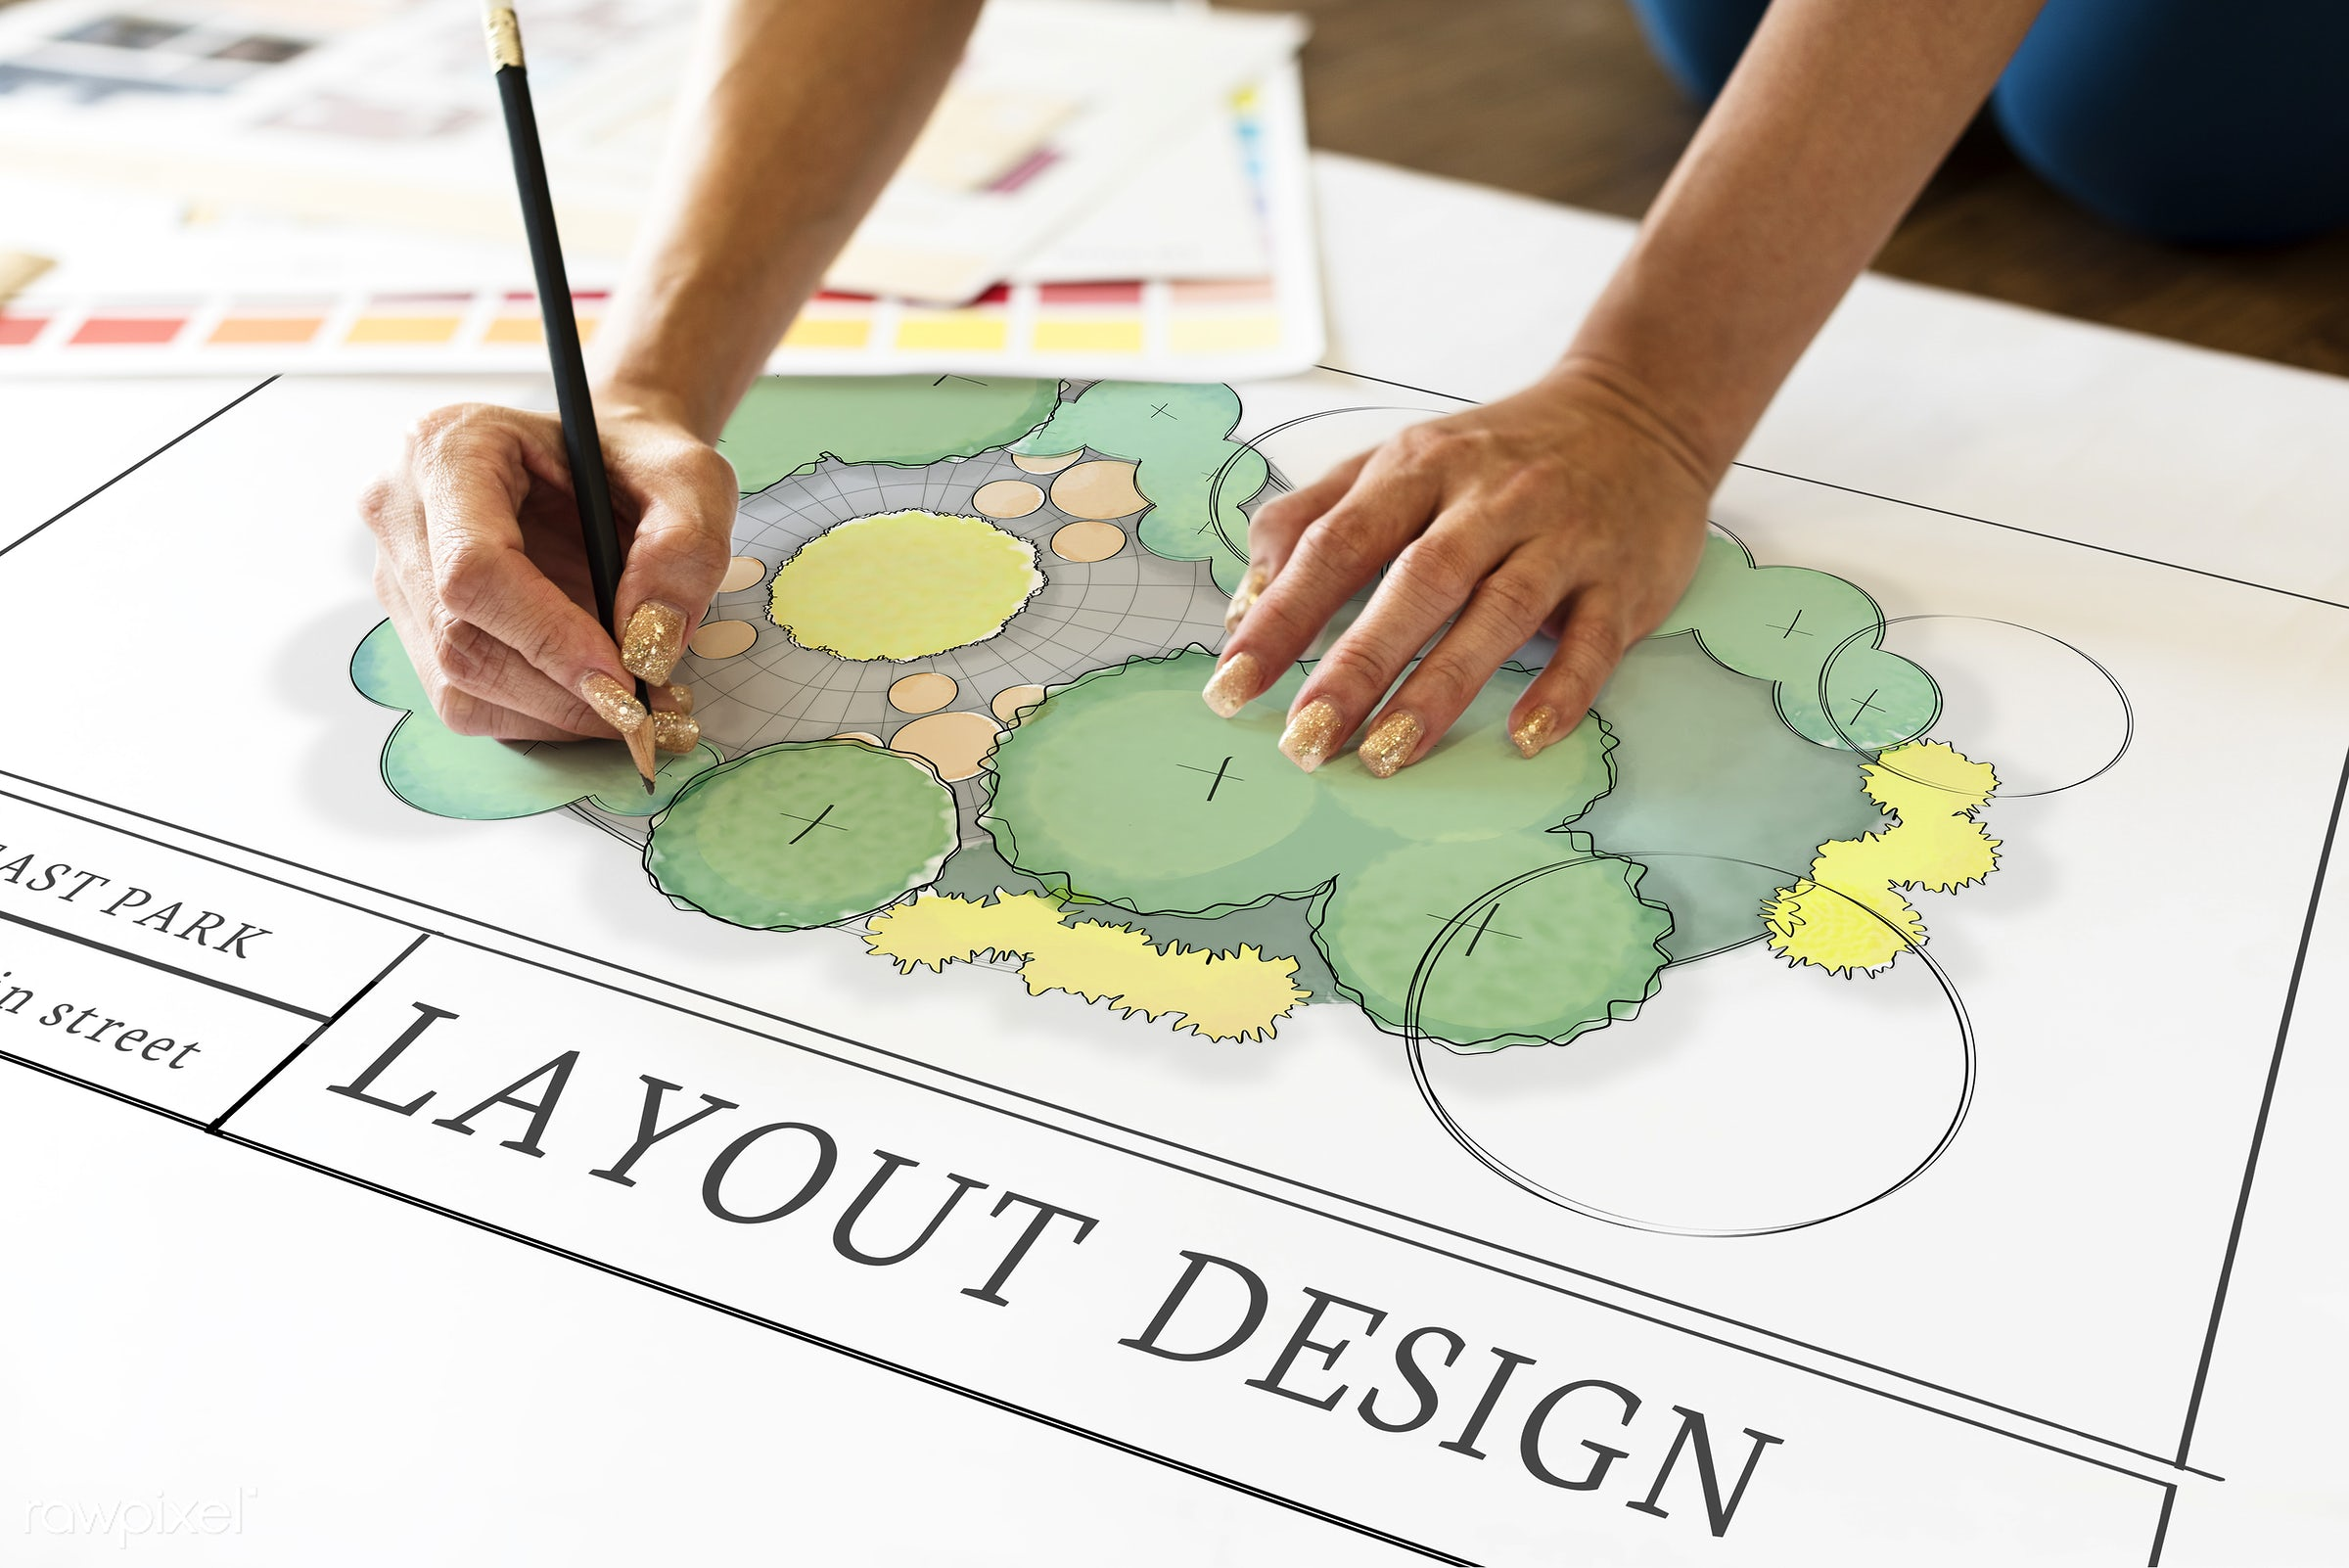 architecture, art, concept, control, creation, creative, creativity, data, design, diagram, digital, drawing, hands, icon,...